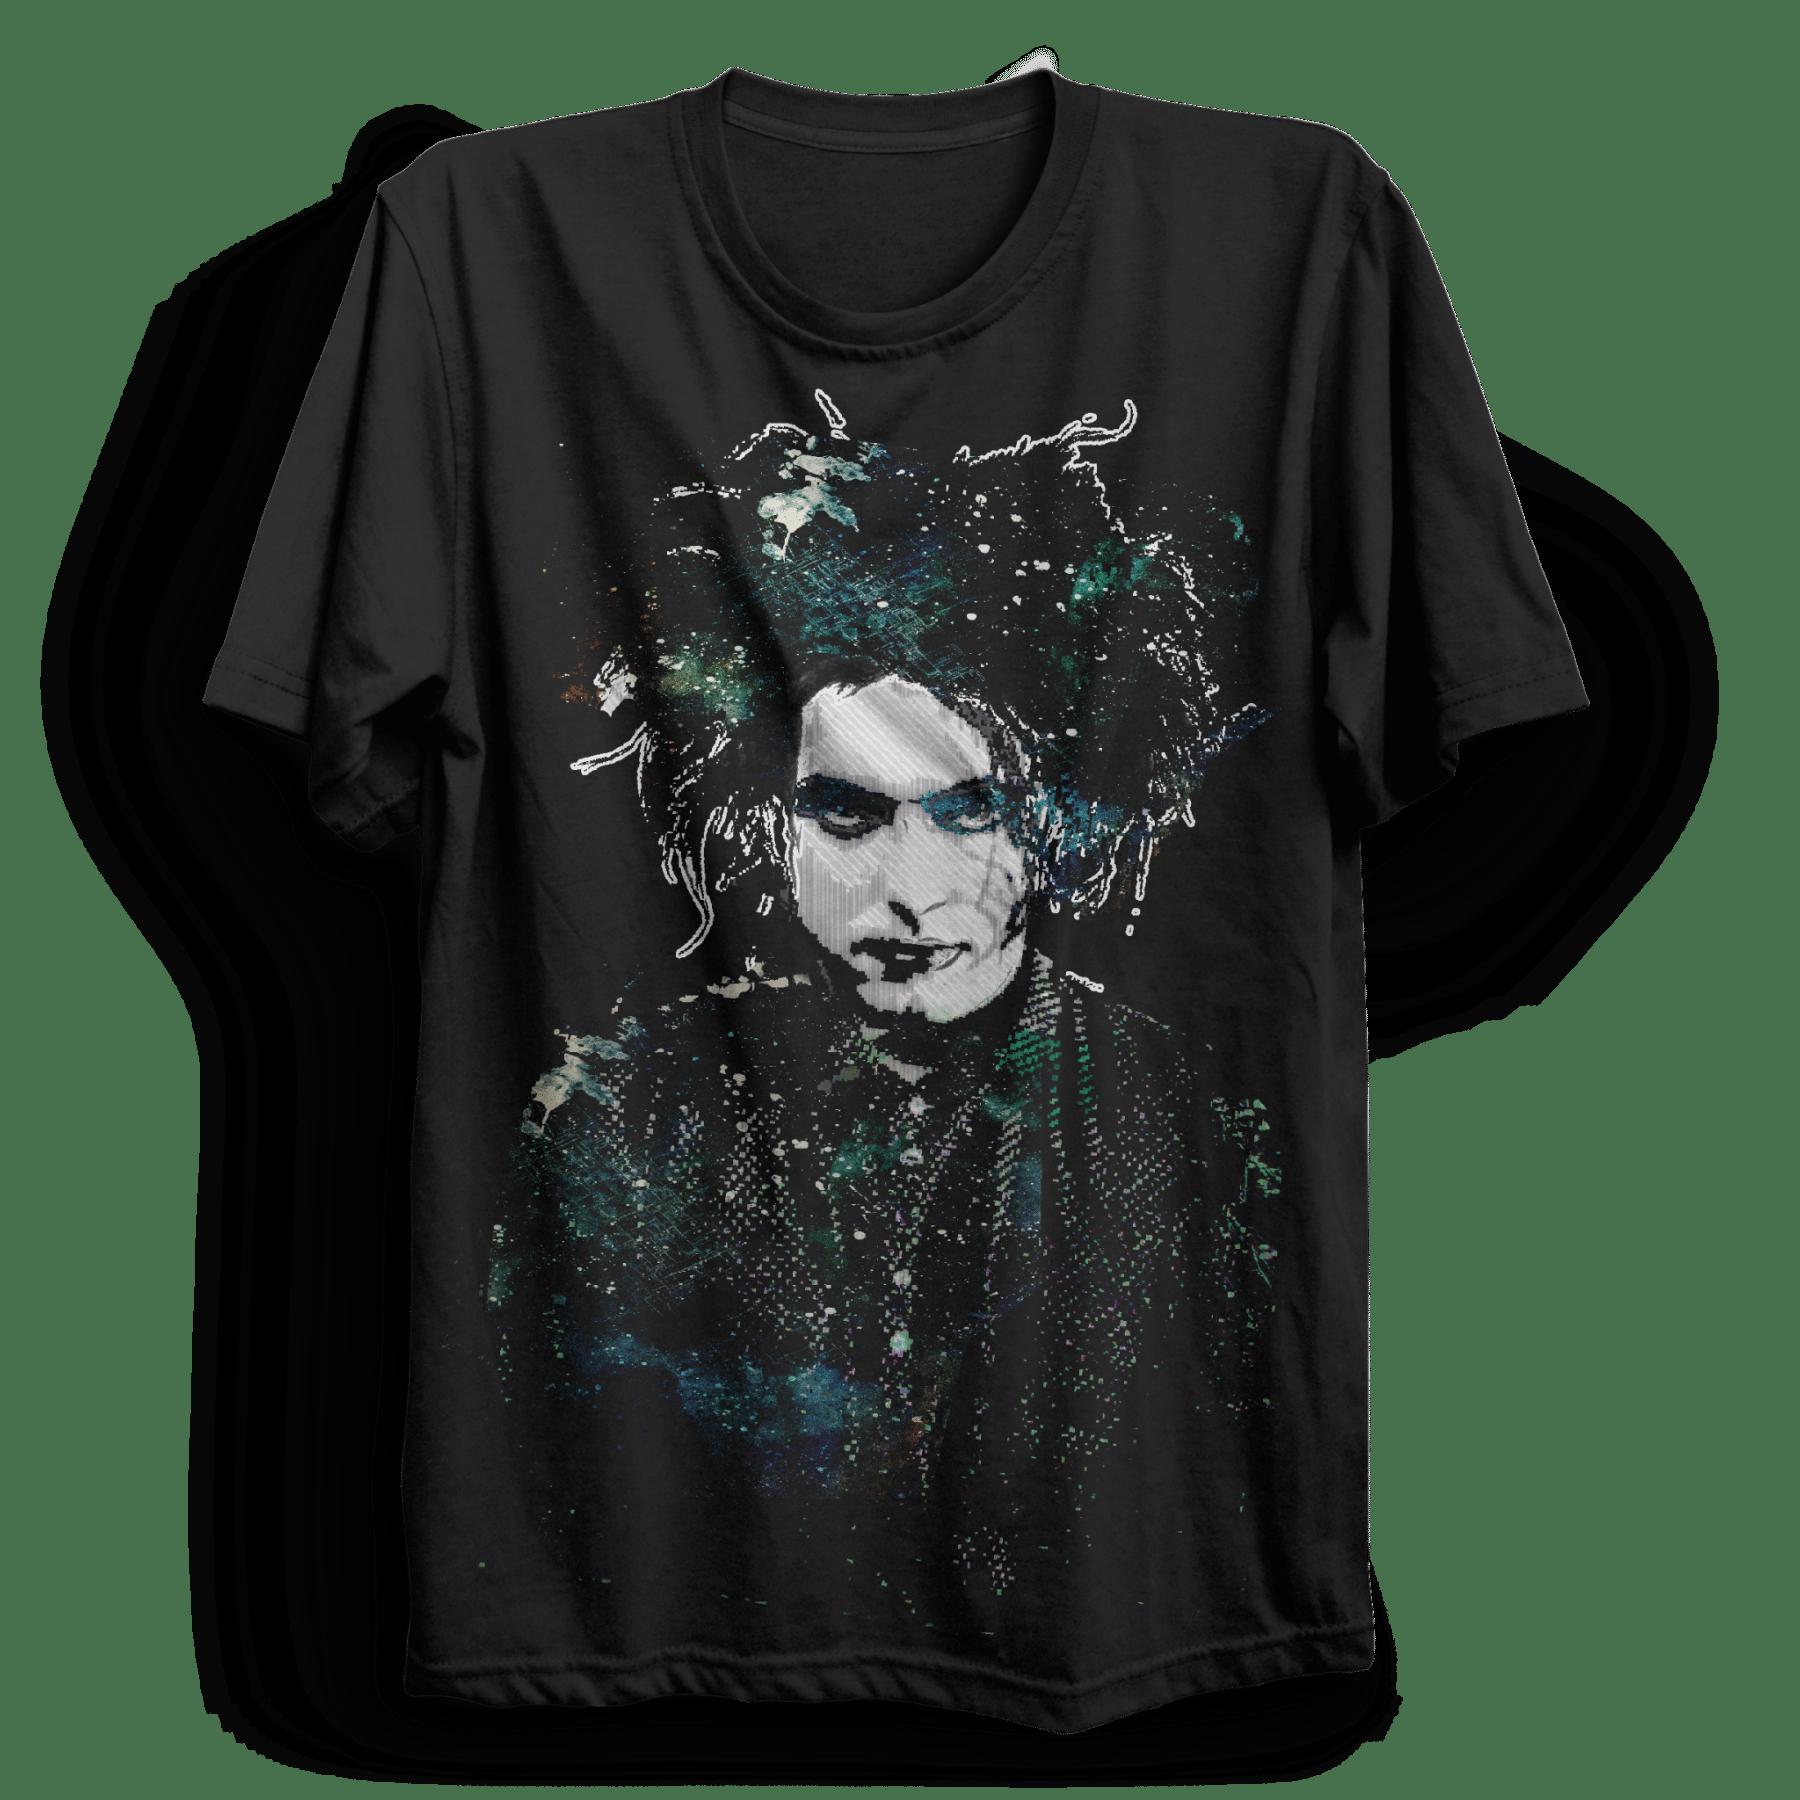 f1896004b Robert Smith, The Cure T-Shirt - PUNX.UK